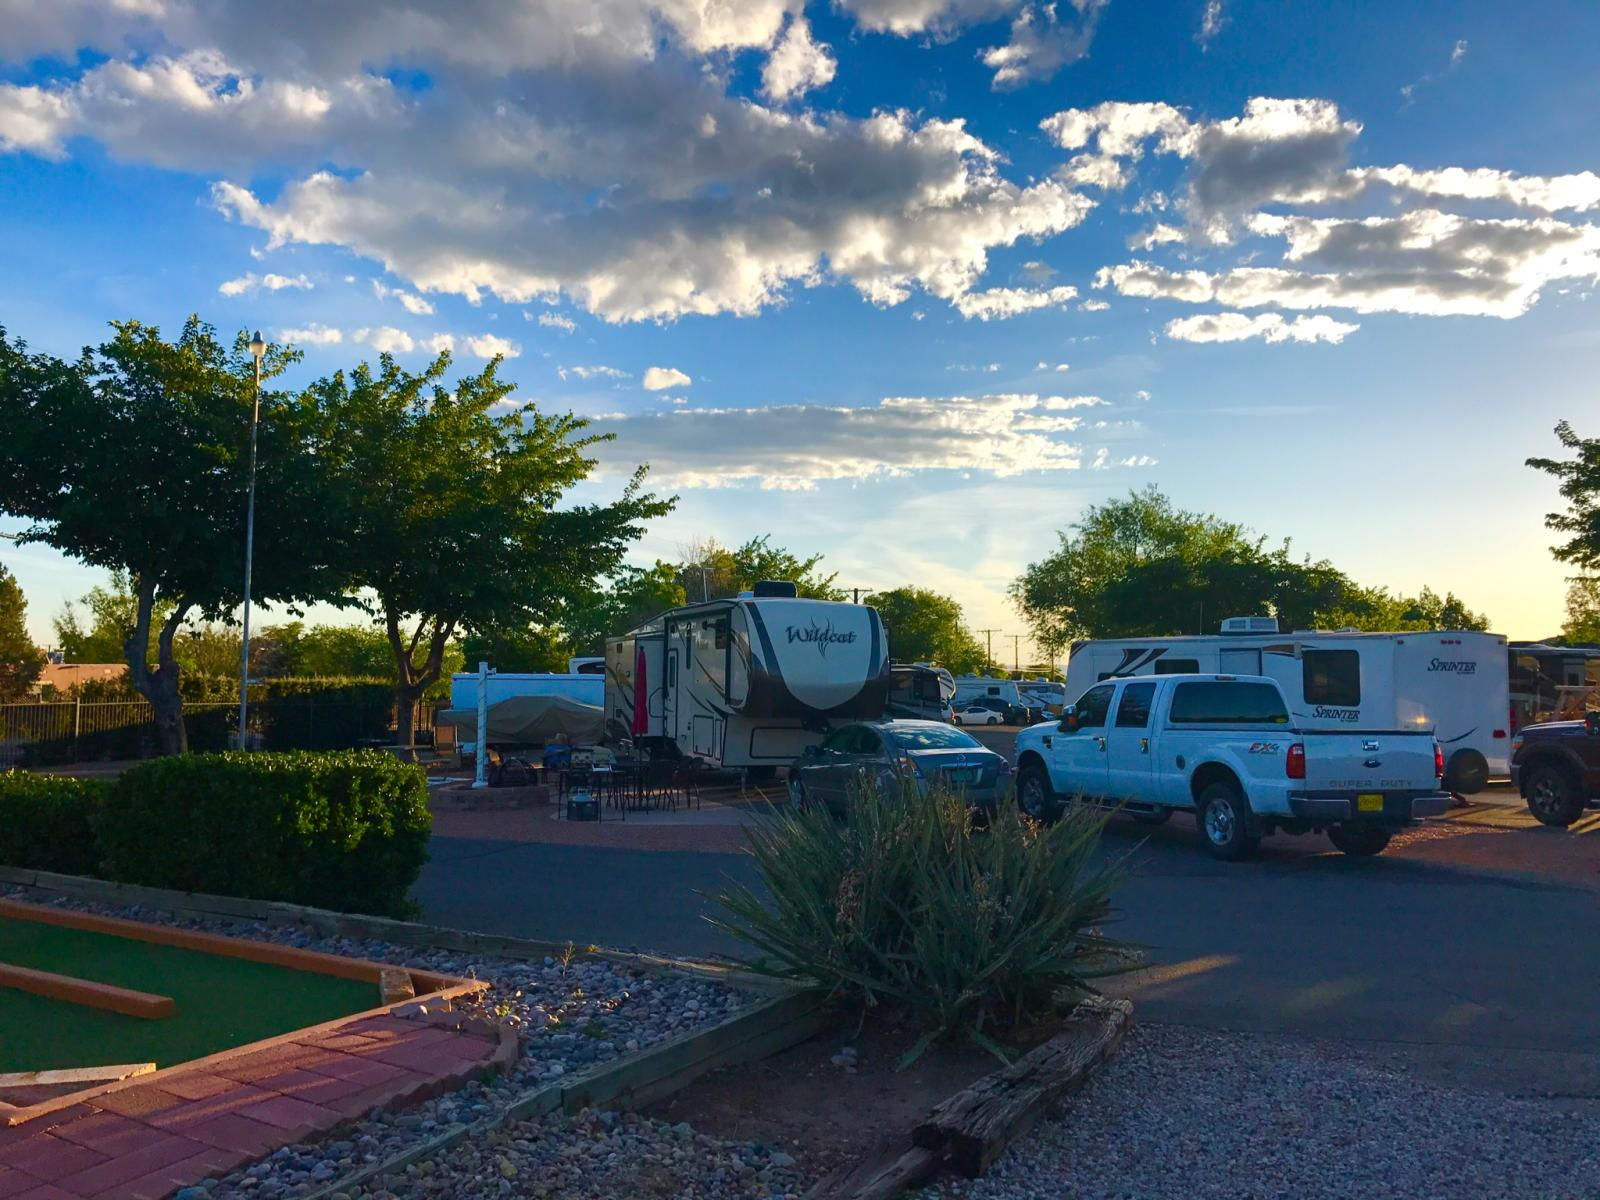 Albuquerque Koa New Mexico Camping Reservations Campgrounds Reserveamerica